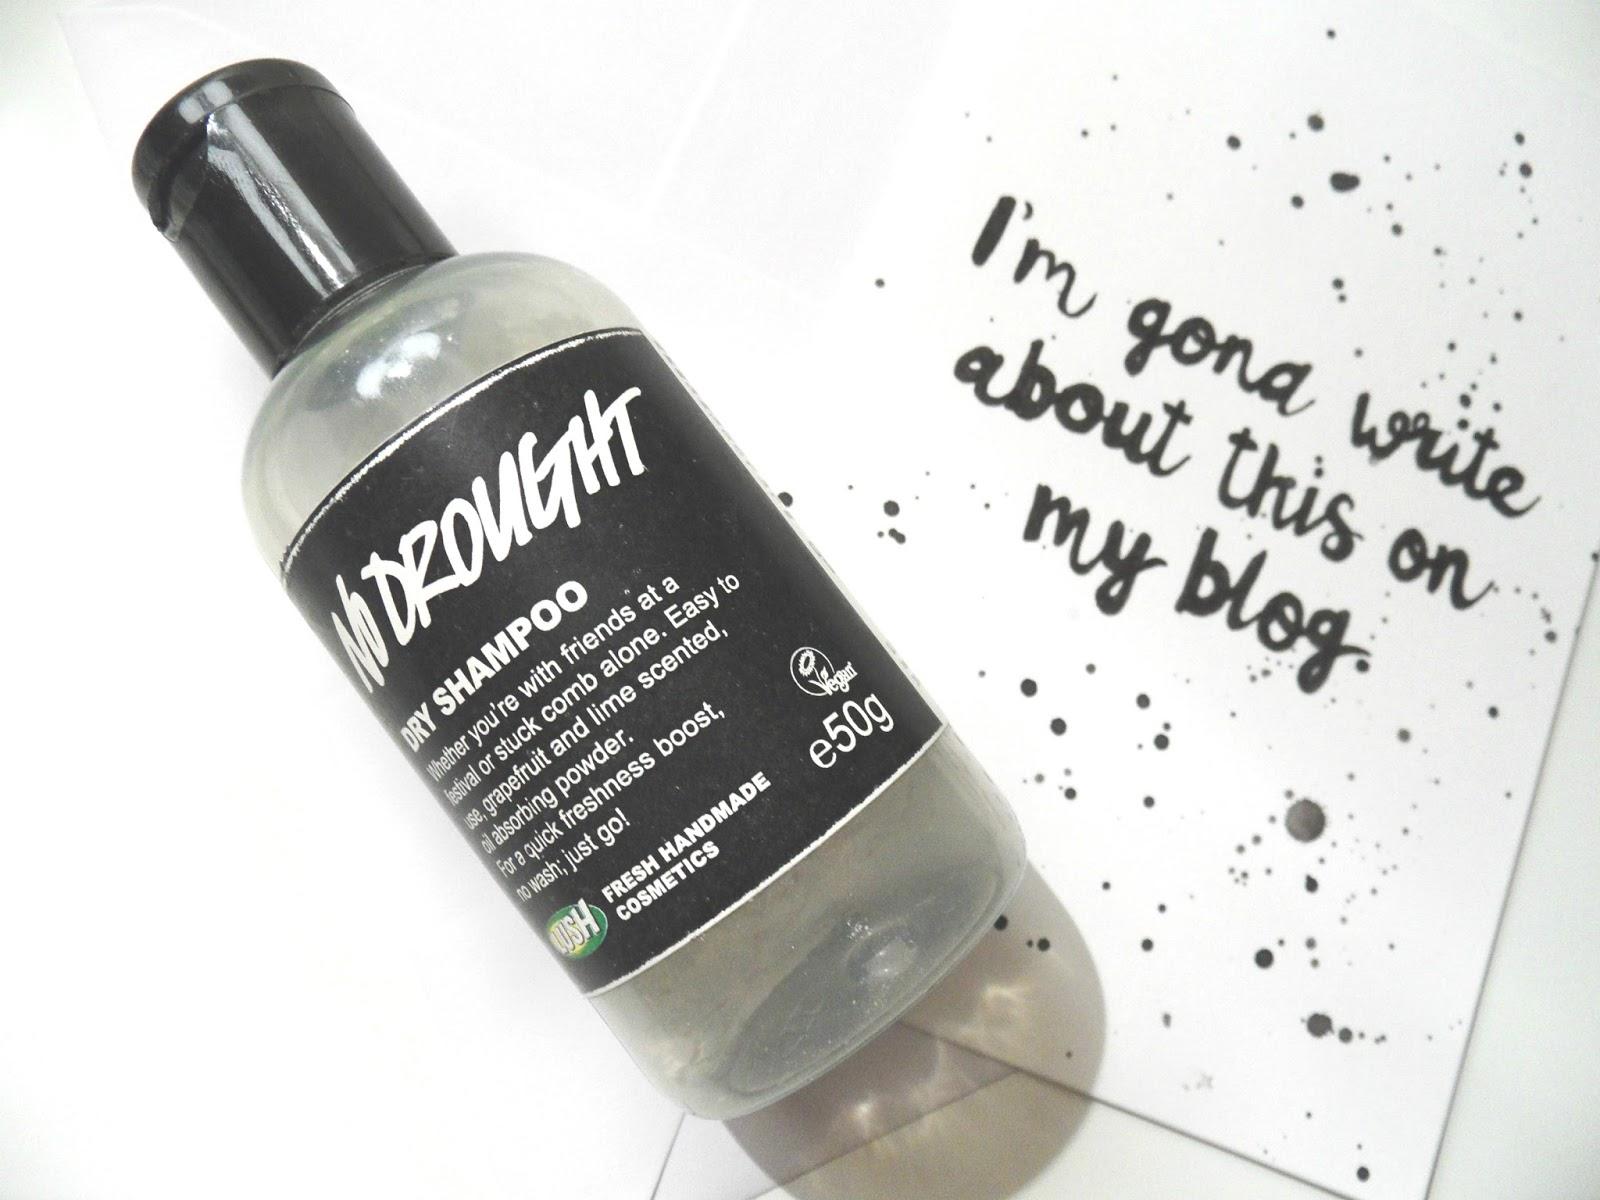 Lush Dry Shampoo Lush No Drought Eyelinerflicks